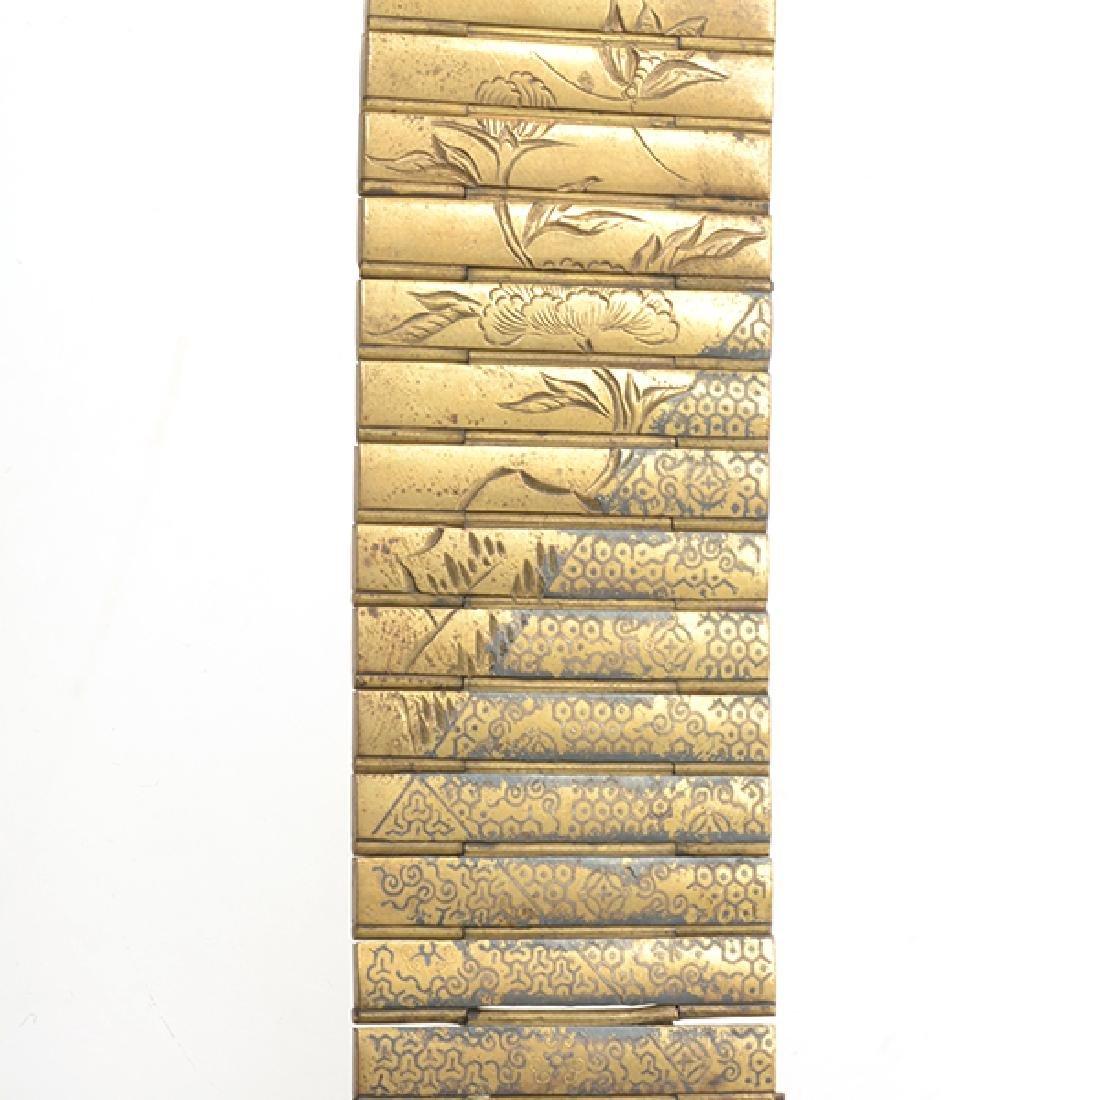 Two Metal Netsuke Applique Chains, Meiji Period - 6